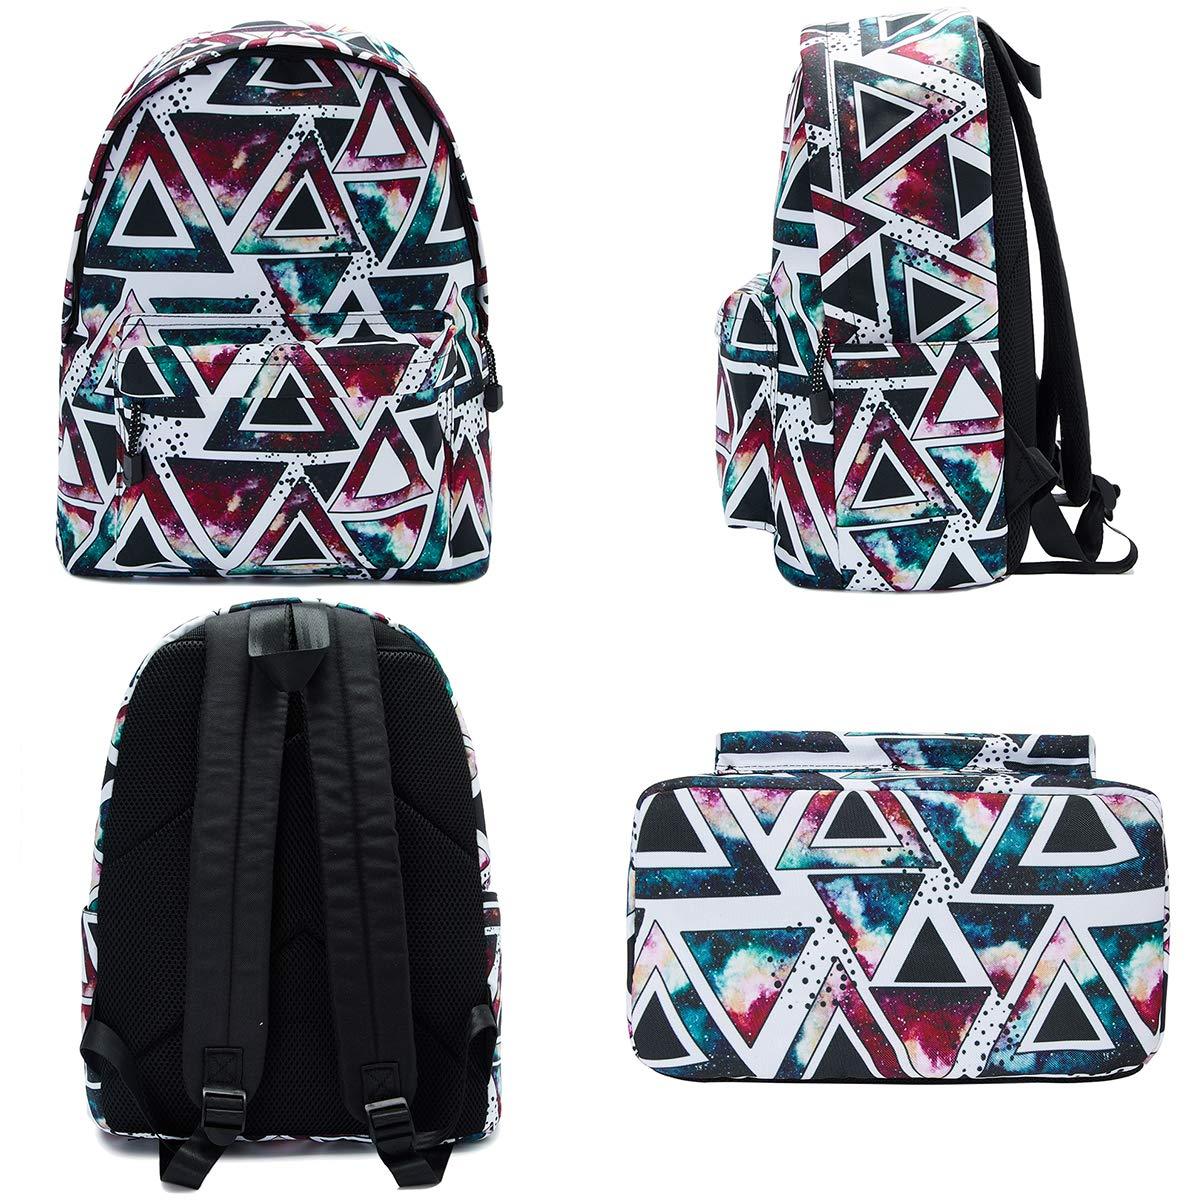 TUONROAD Schulrucksack Teenager Modischer Kaktus Freizeitrucksack Schulrucksack Aufdruck Rucksack Daypack Laptop Tasche Backpack